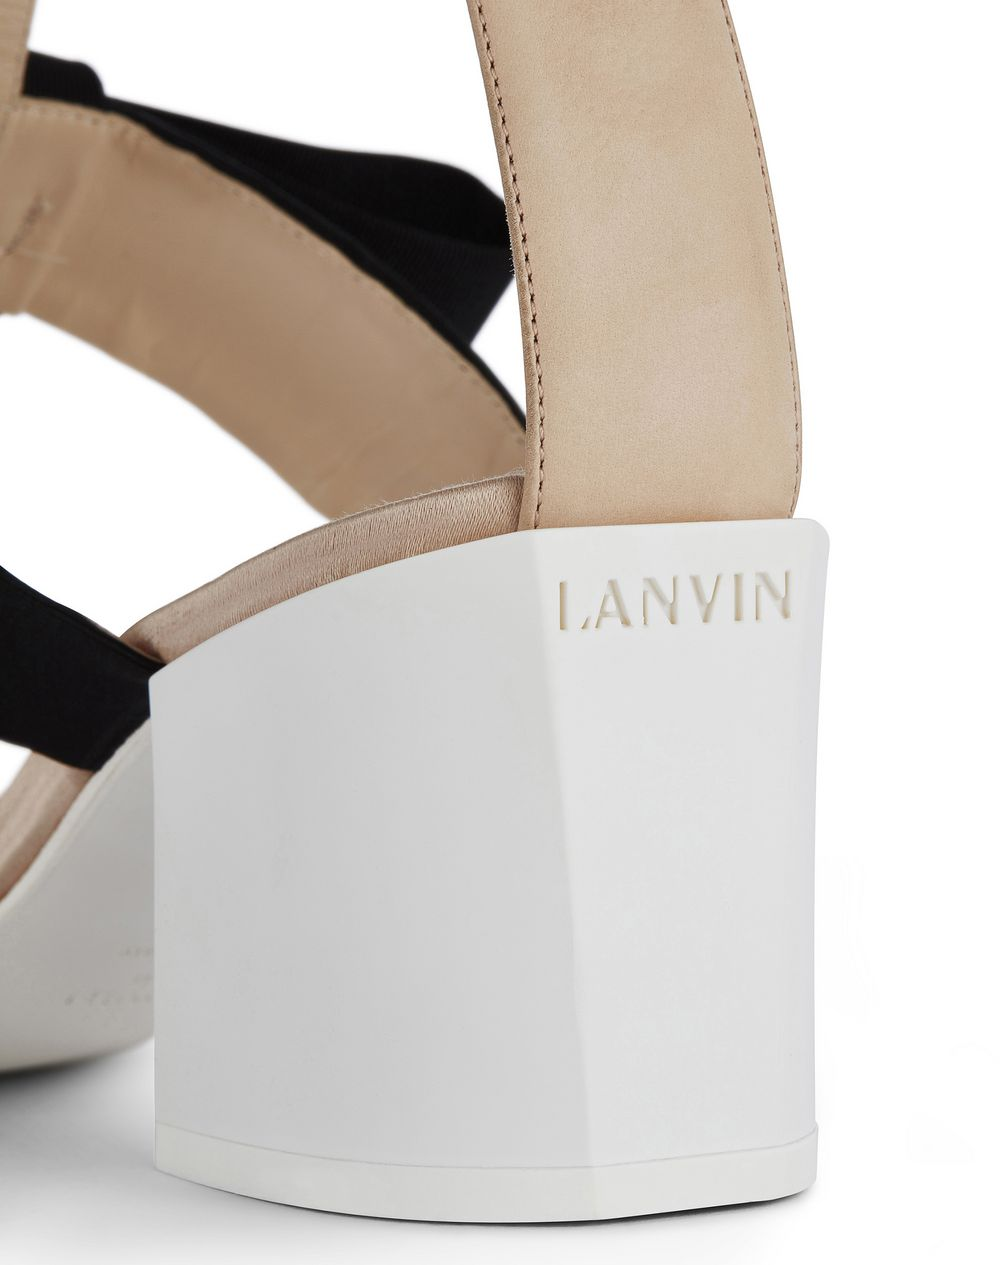 GLADIATOR BOW SANDAL  - Lanvin